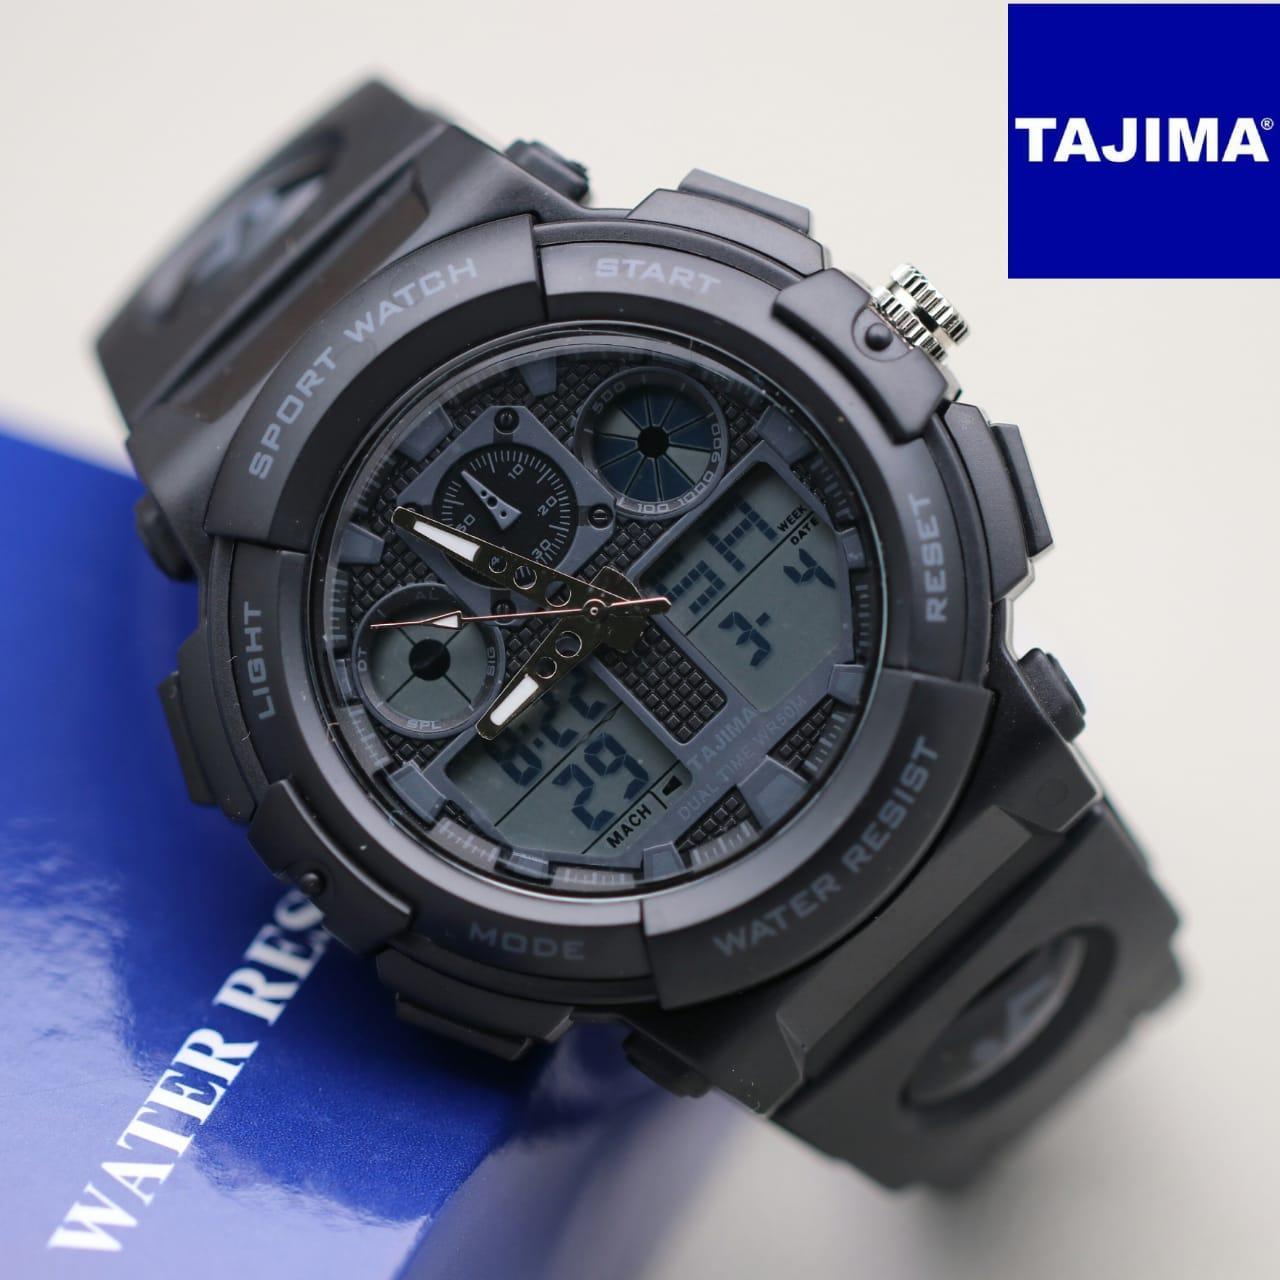 Jam Tangan Pria Analog Tajima Water Resistant / Watch Analog Tajima 26